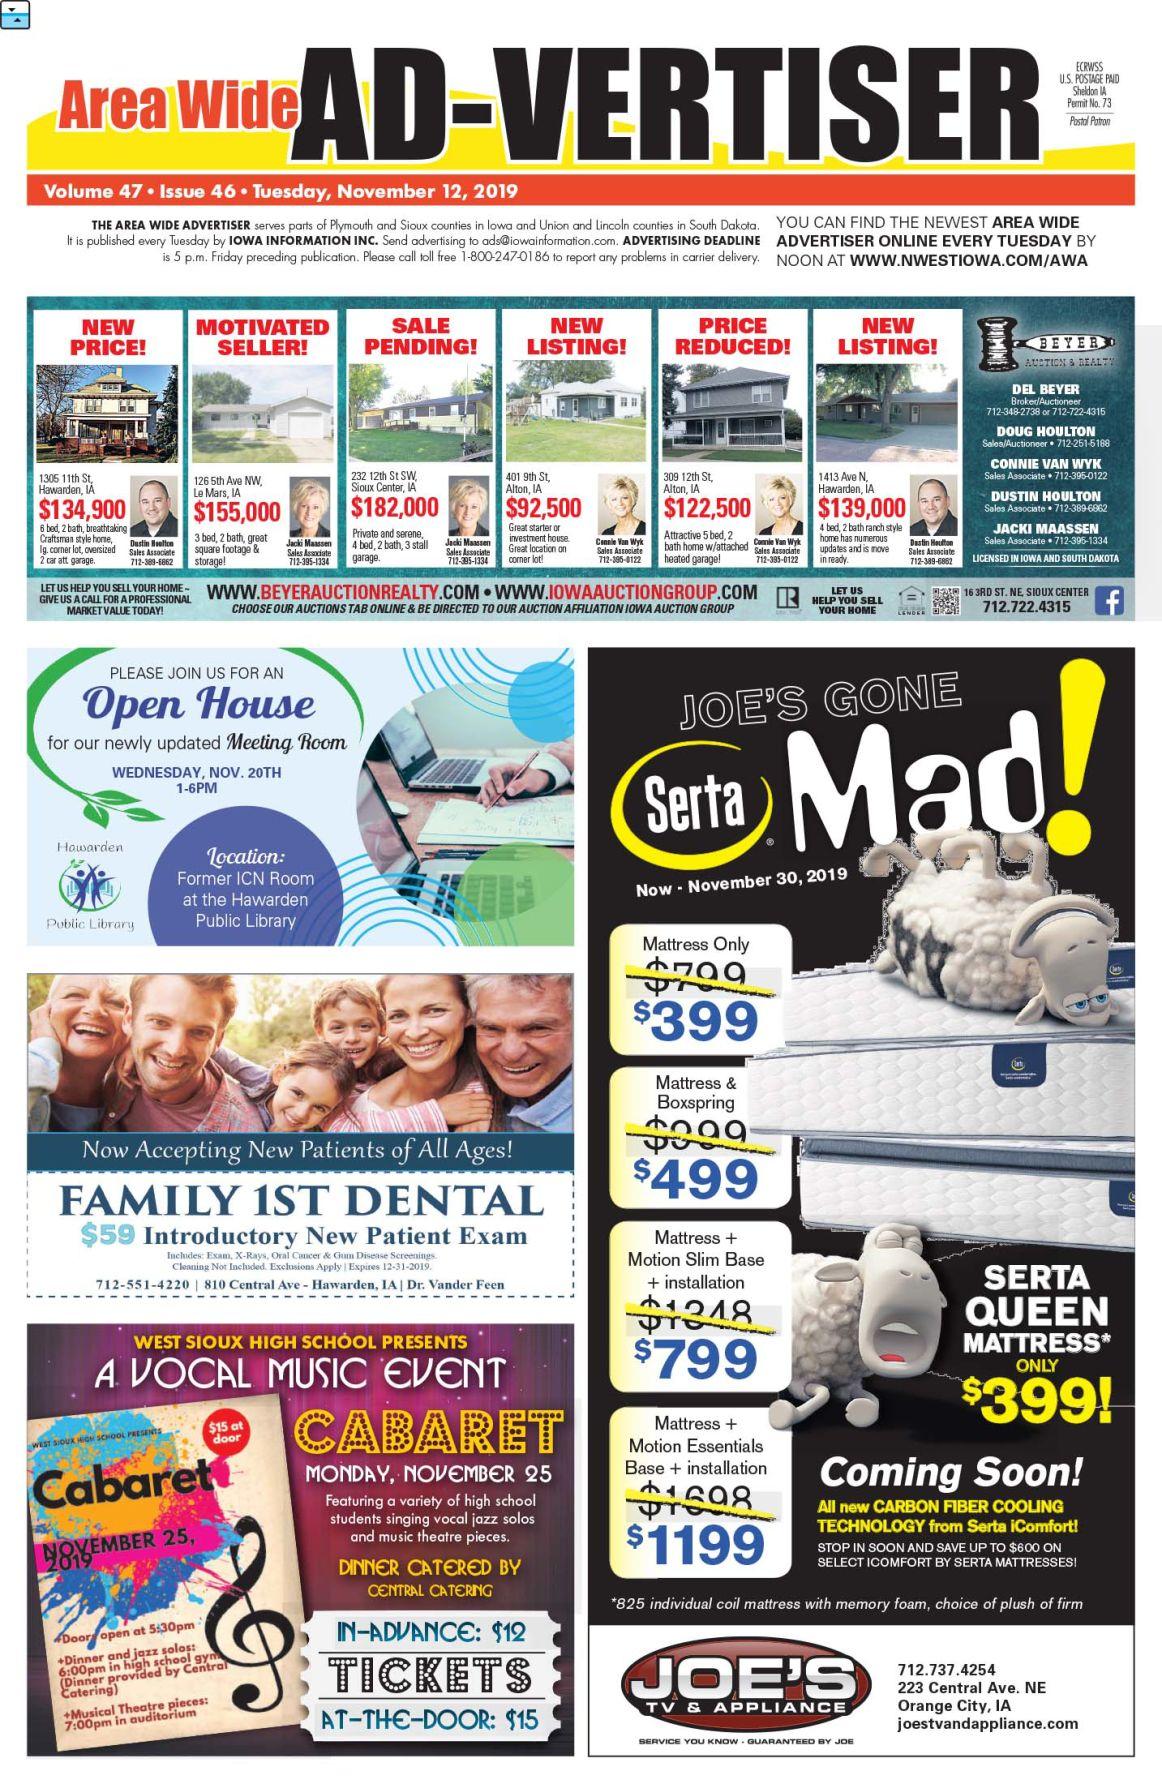 Area Wide Ad-vertiser: November 12, 2019